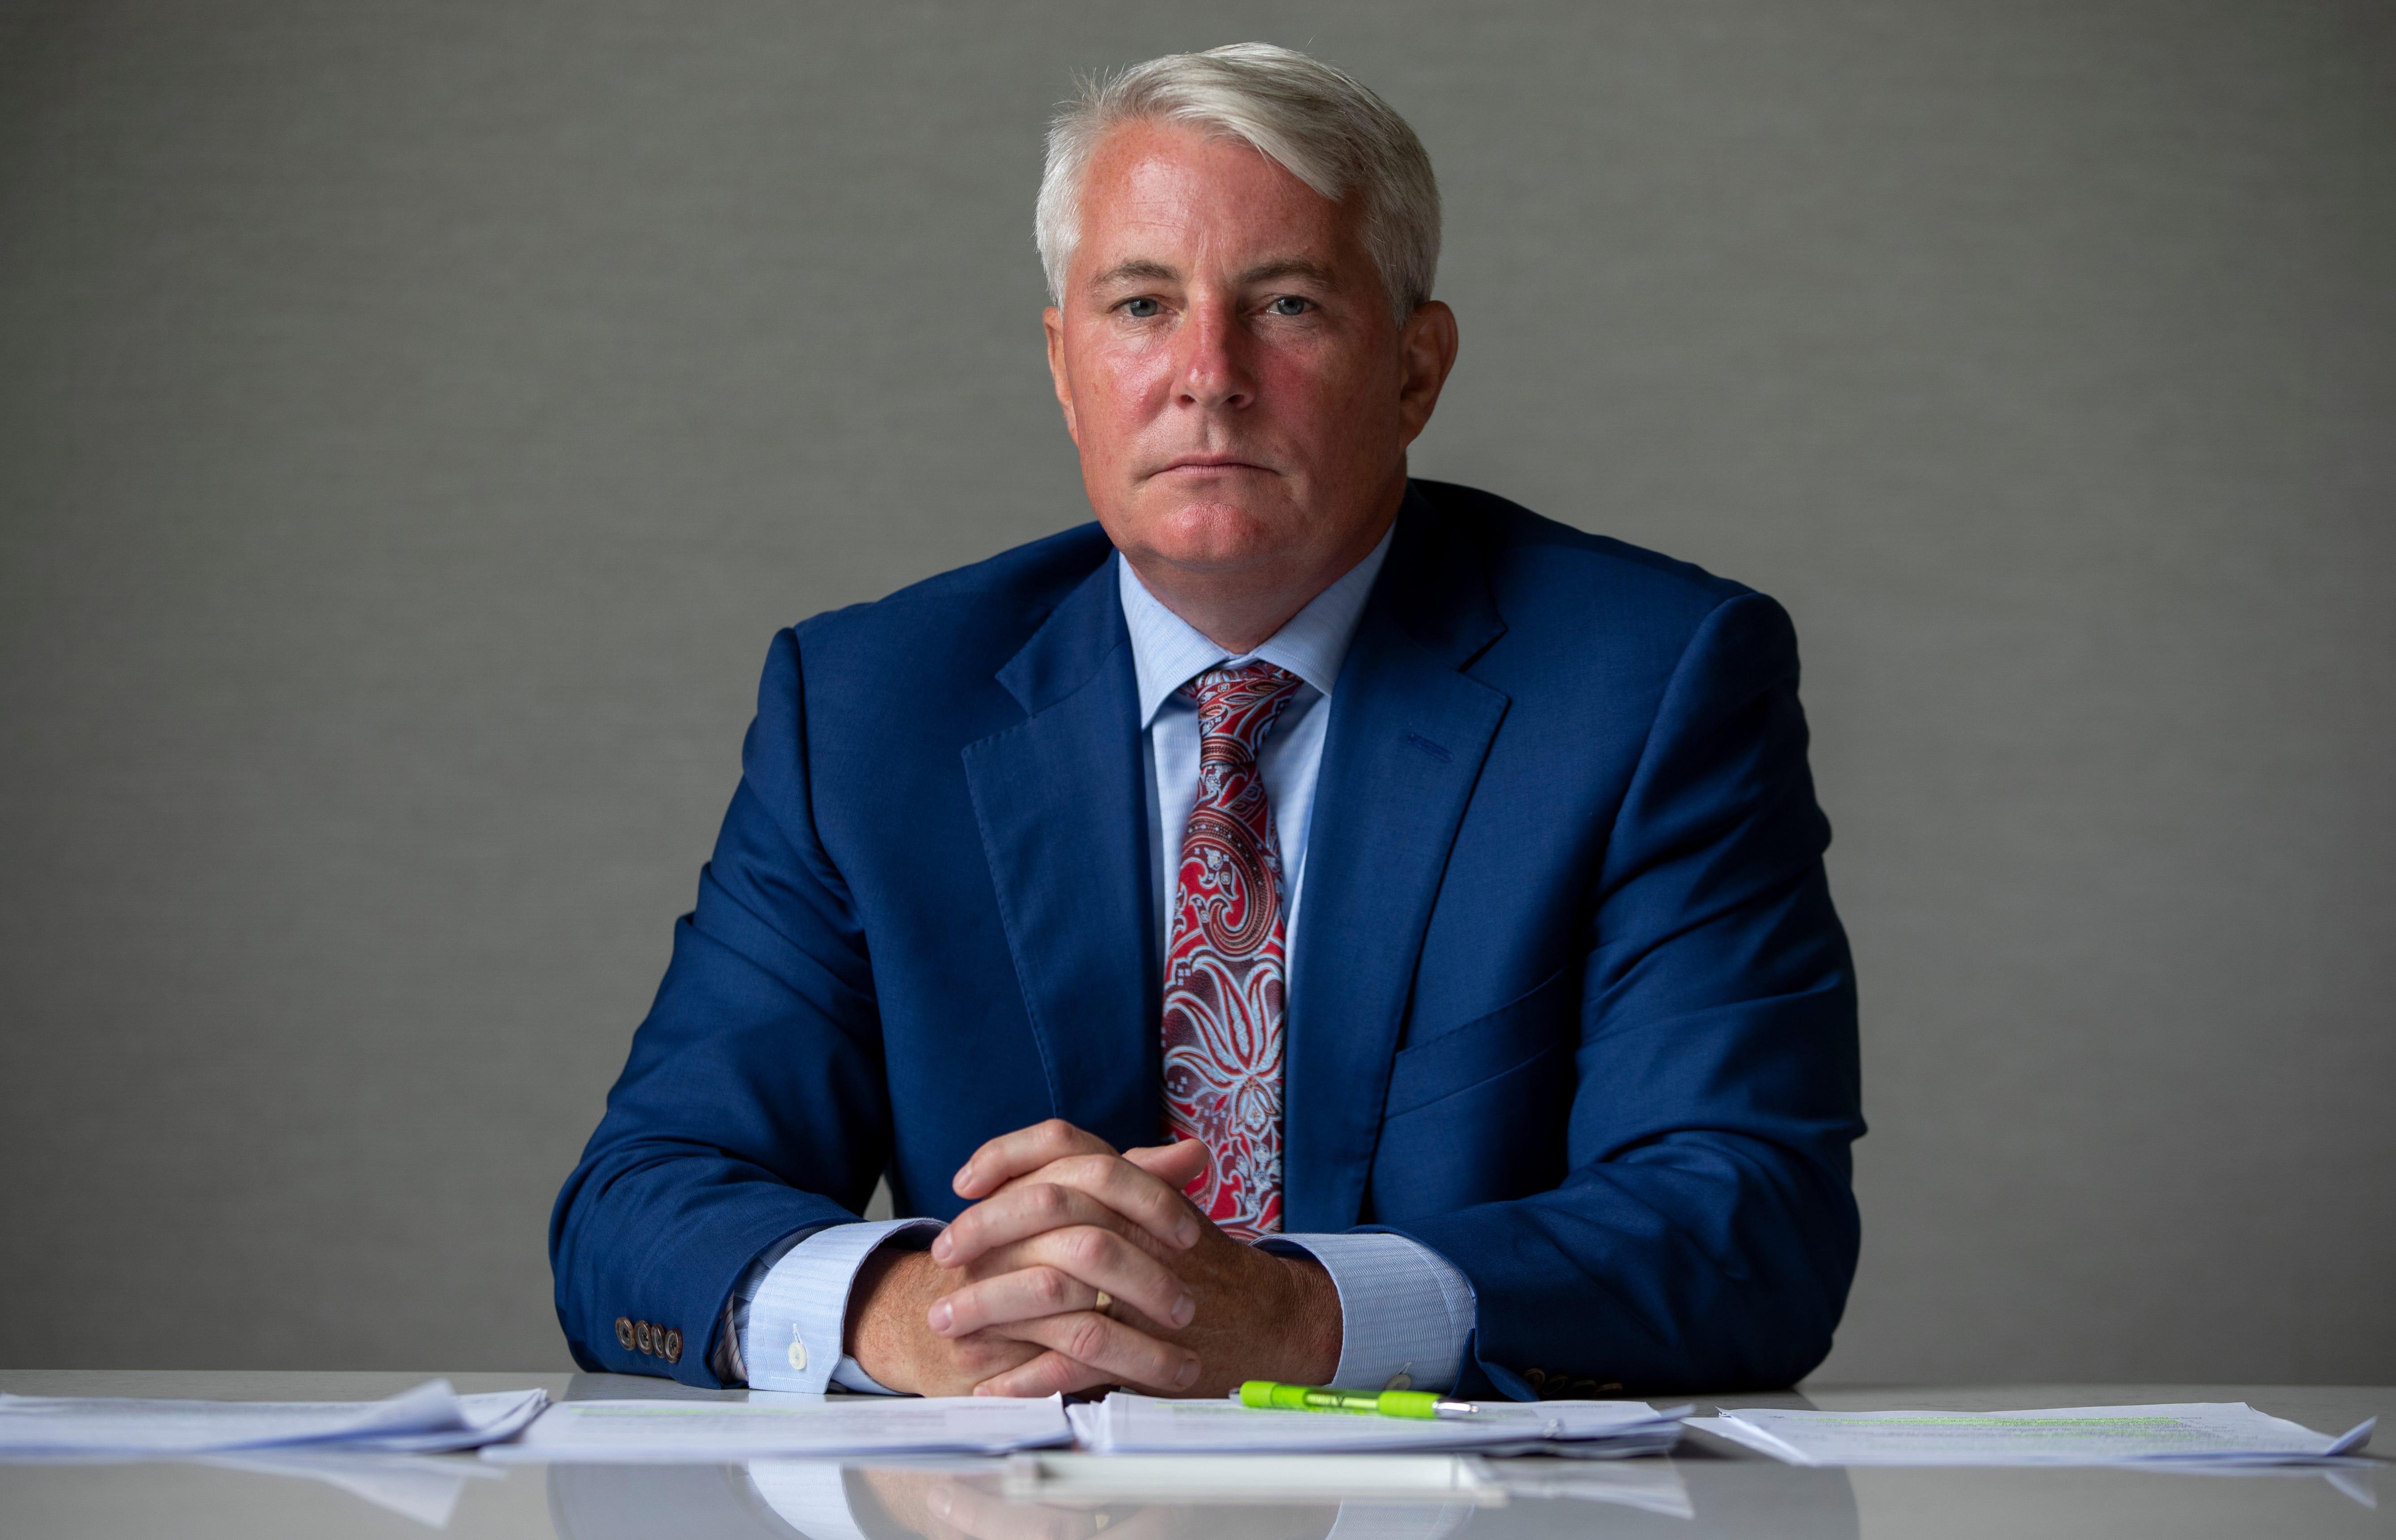 Attorney Stephen Wagner